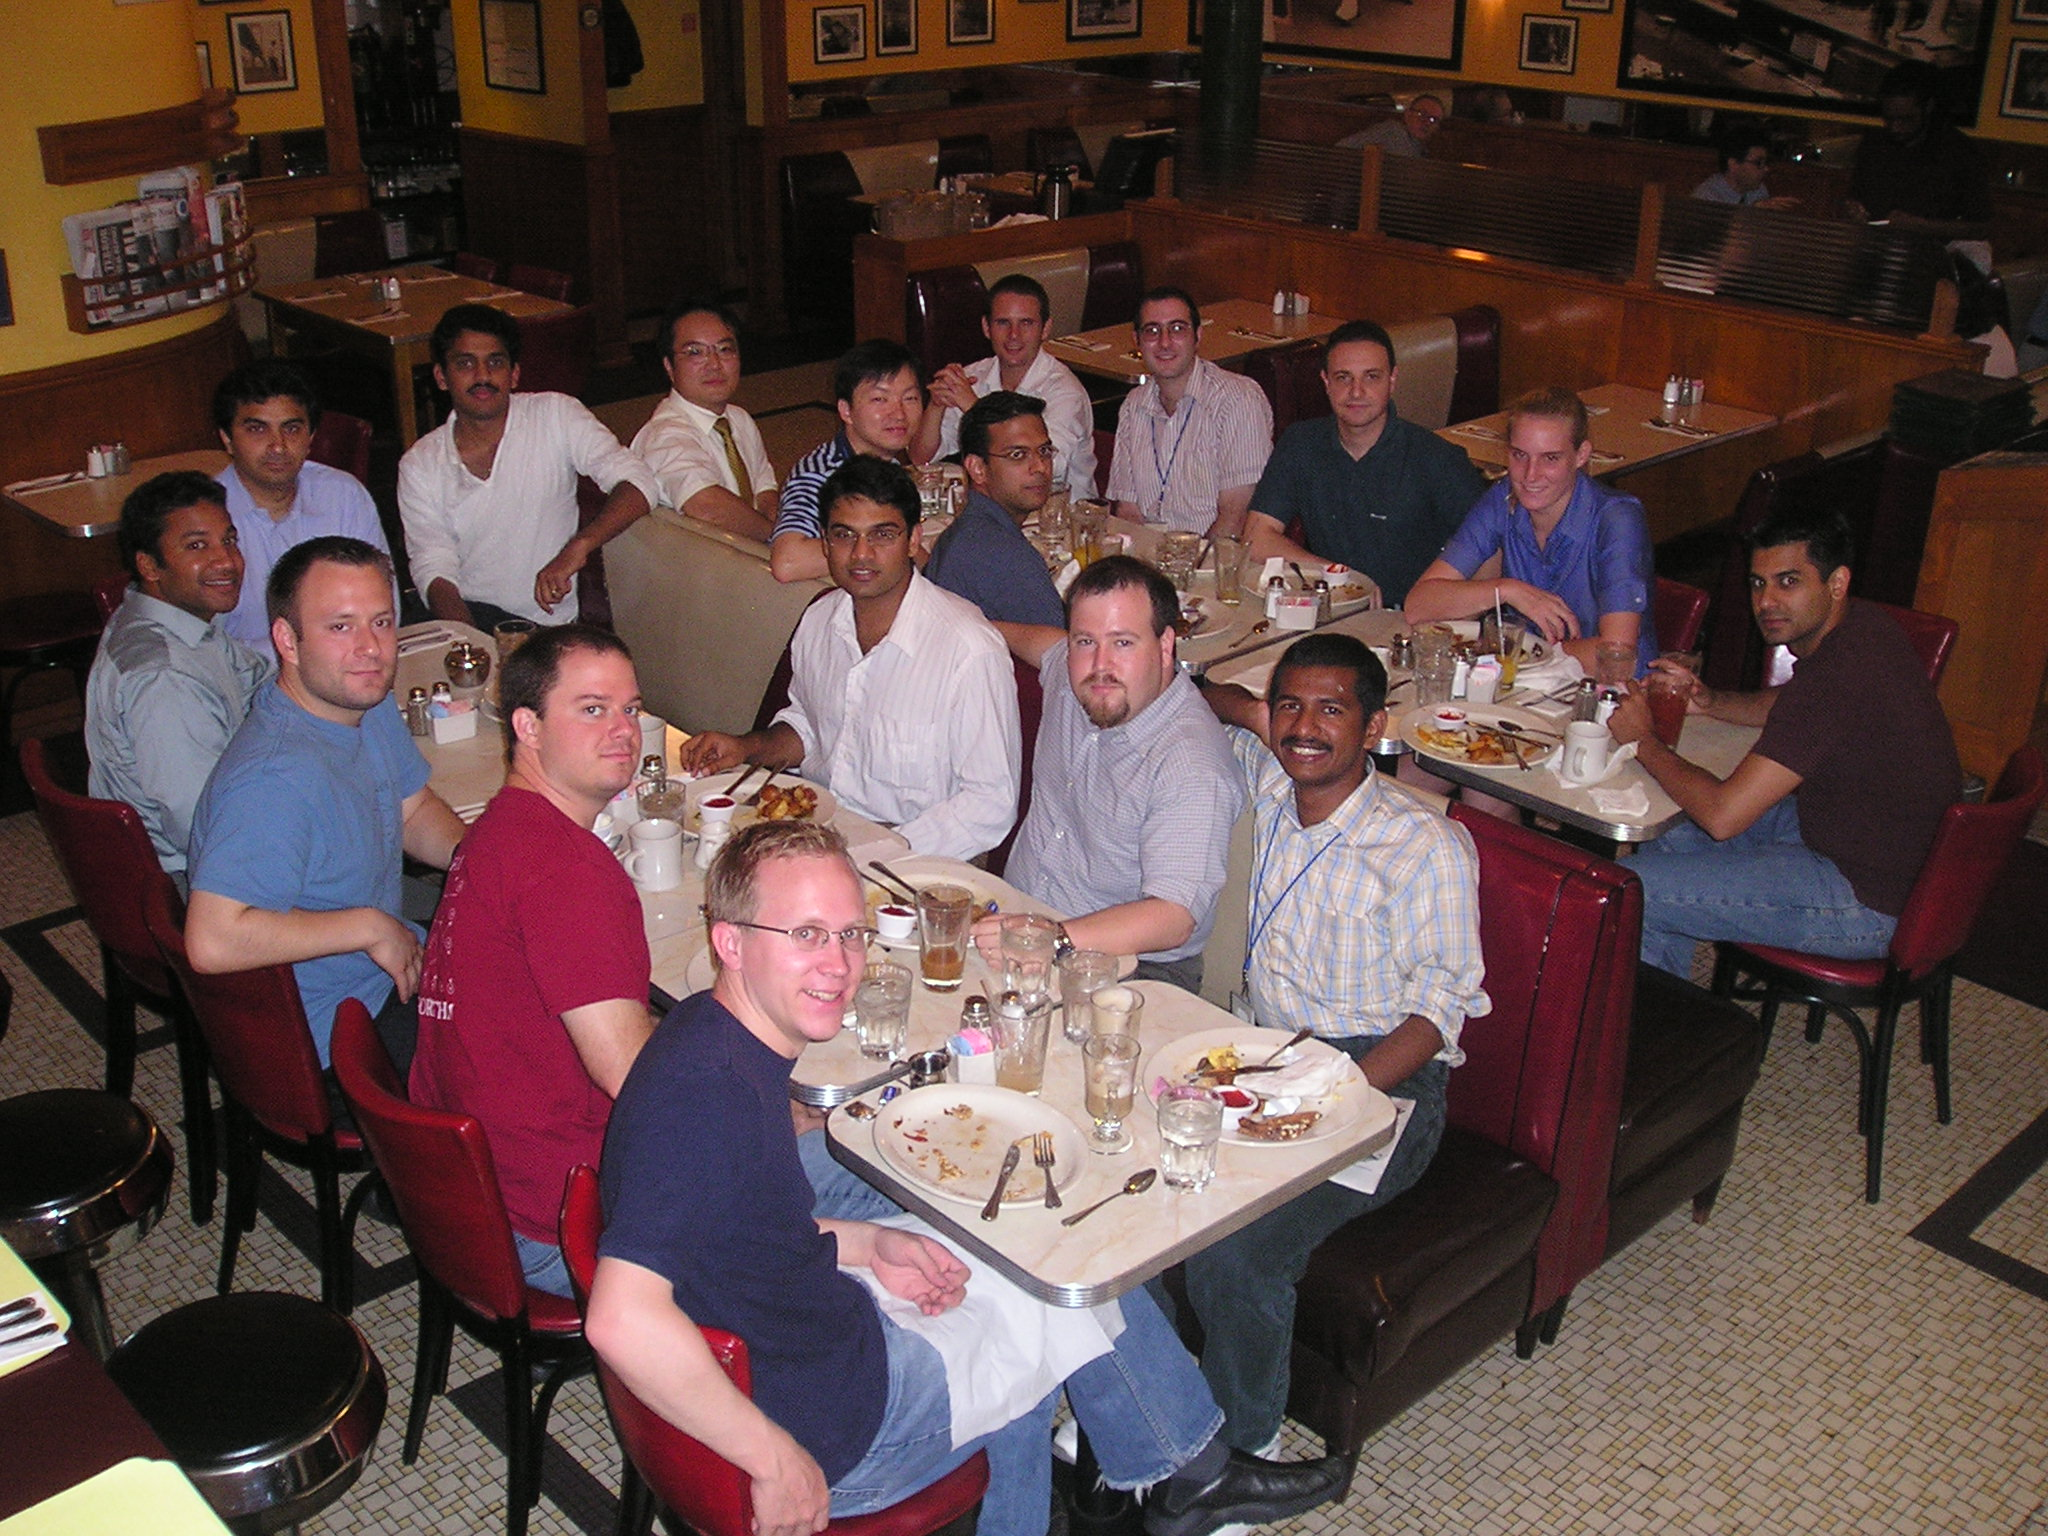 Teamcore Breakfast 2004